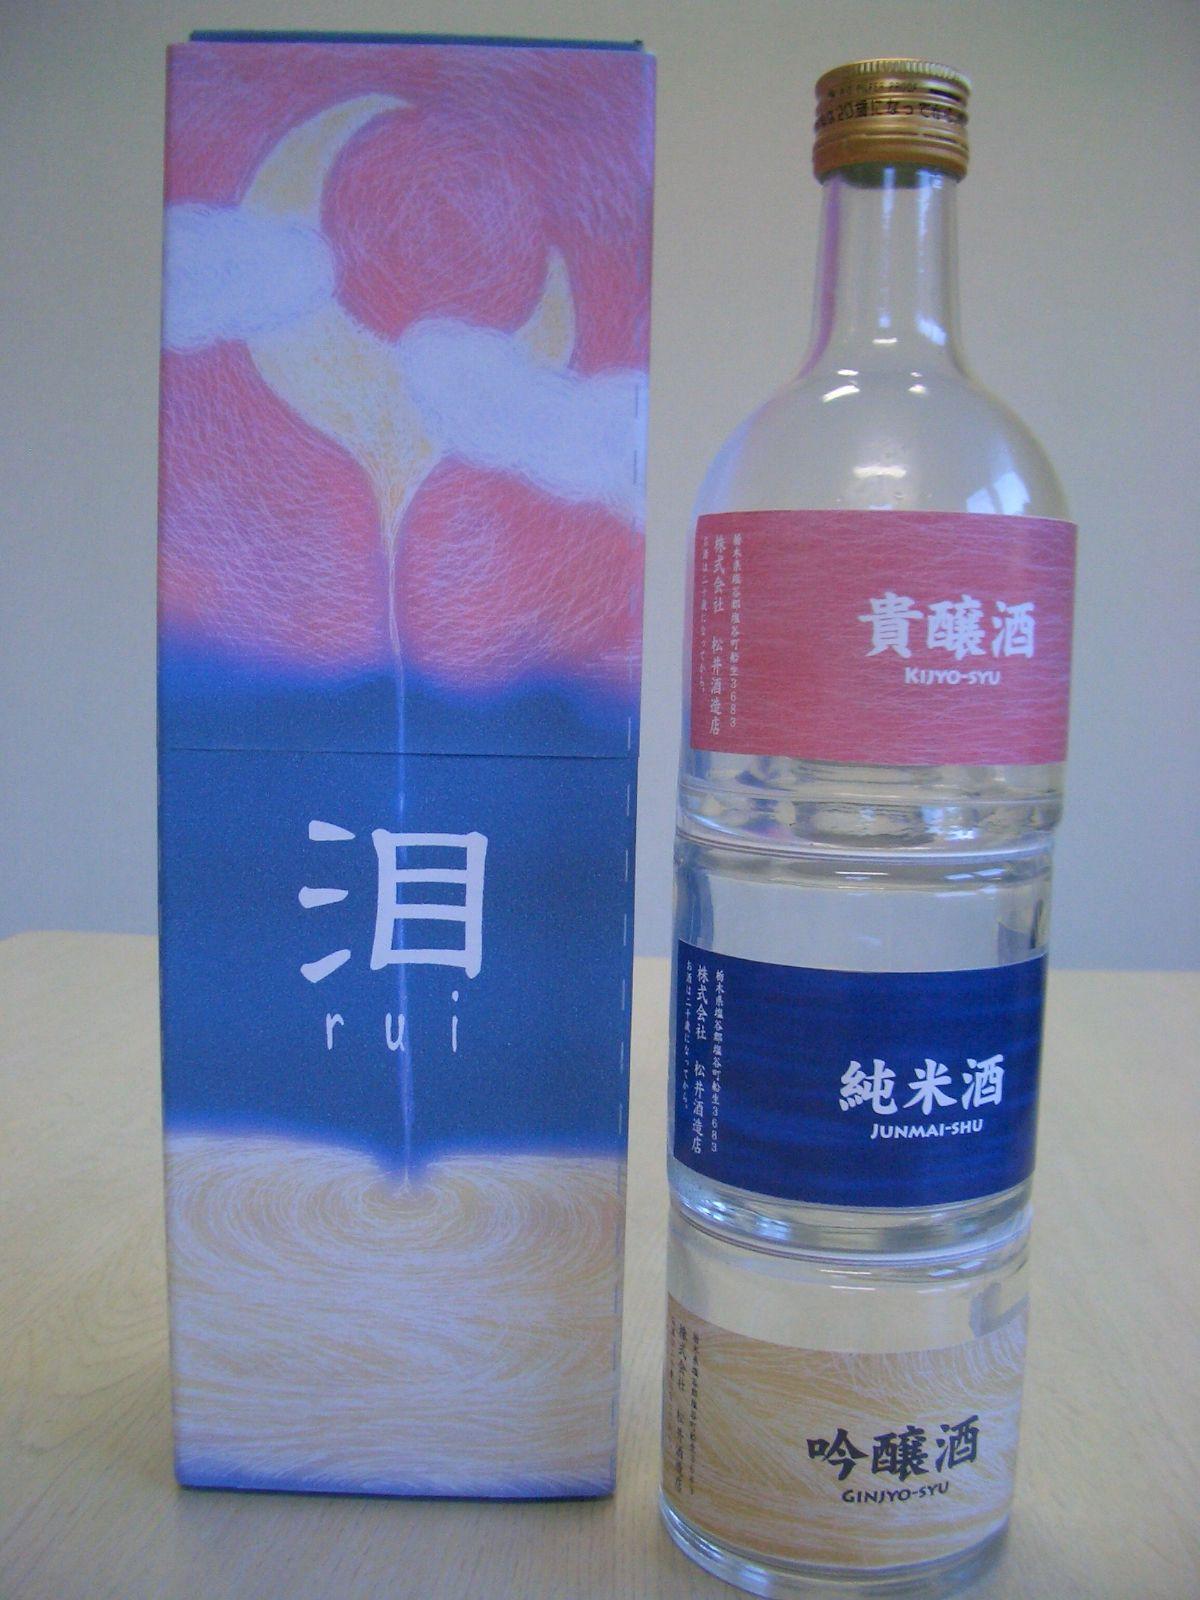 http://livedoor.blogimg.jp/wakabajirushi/imgs/6/5/6523dd3f.JPG